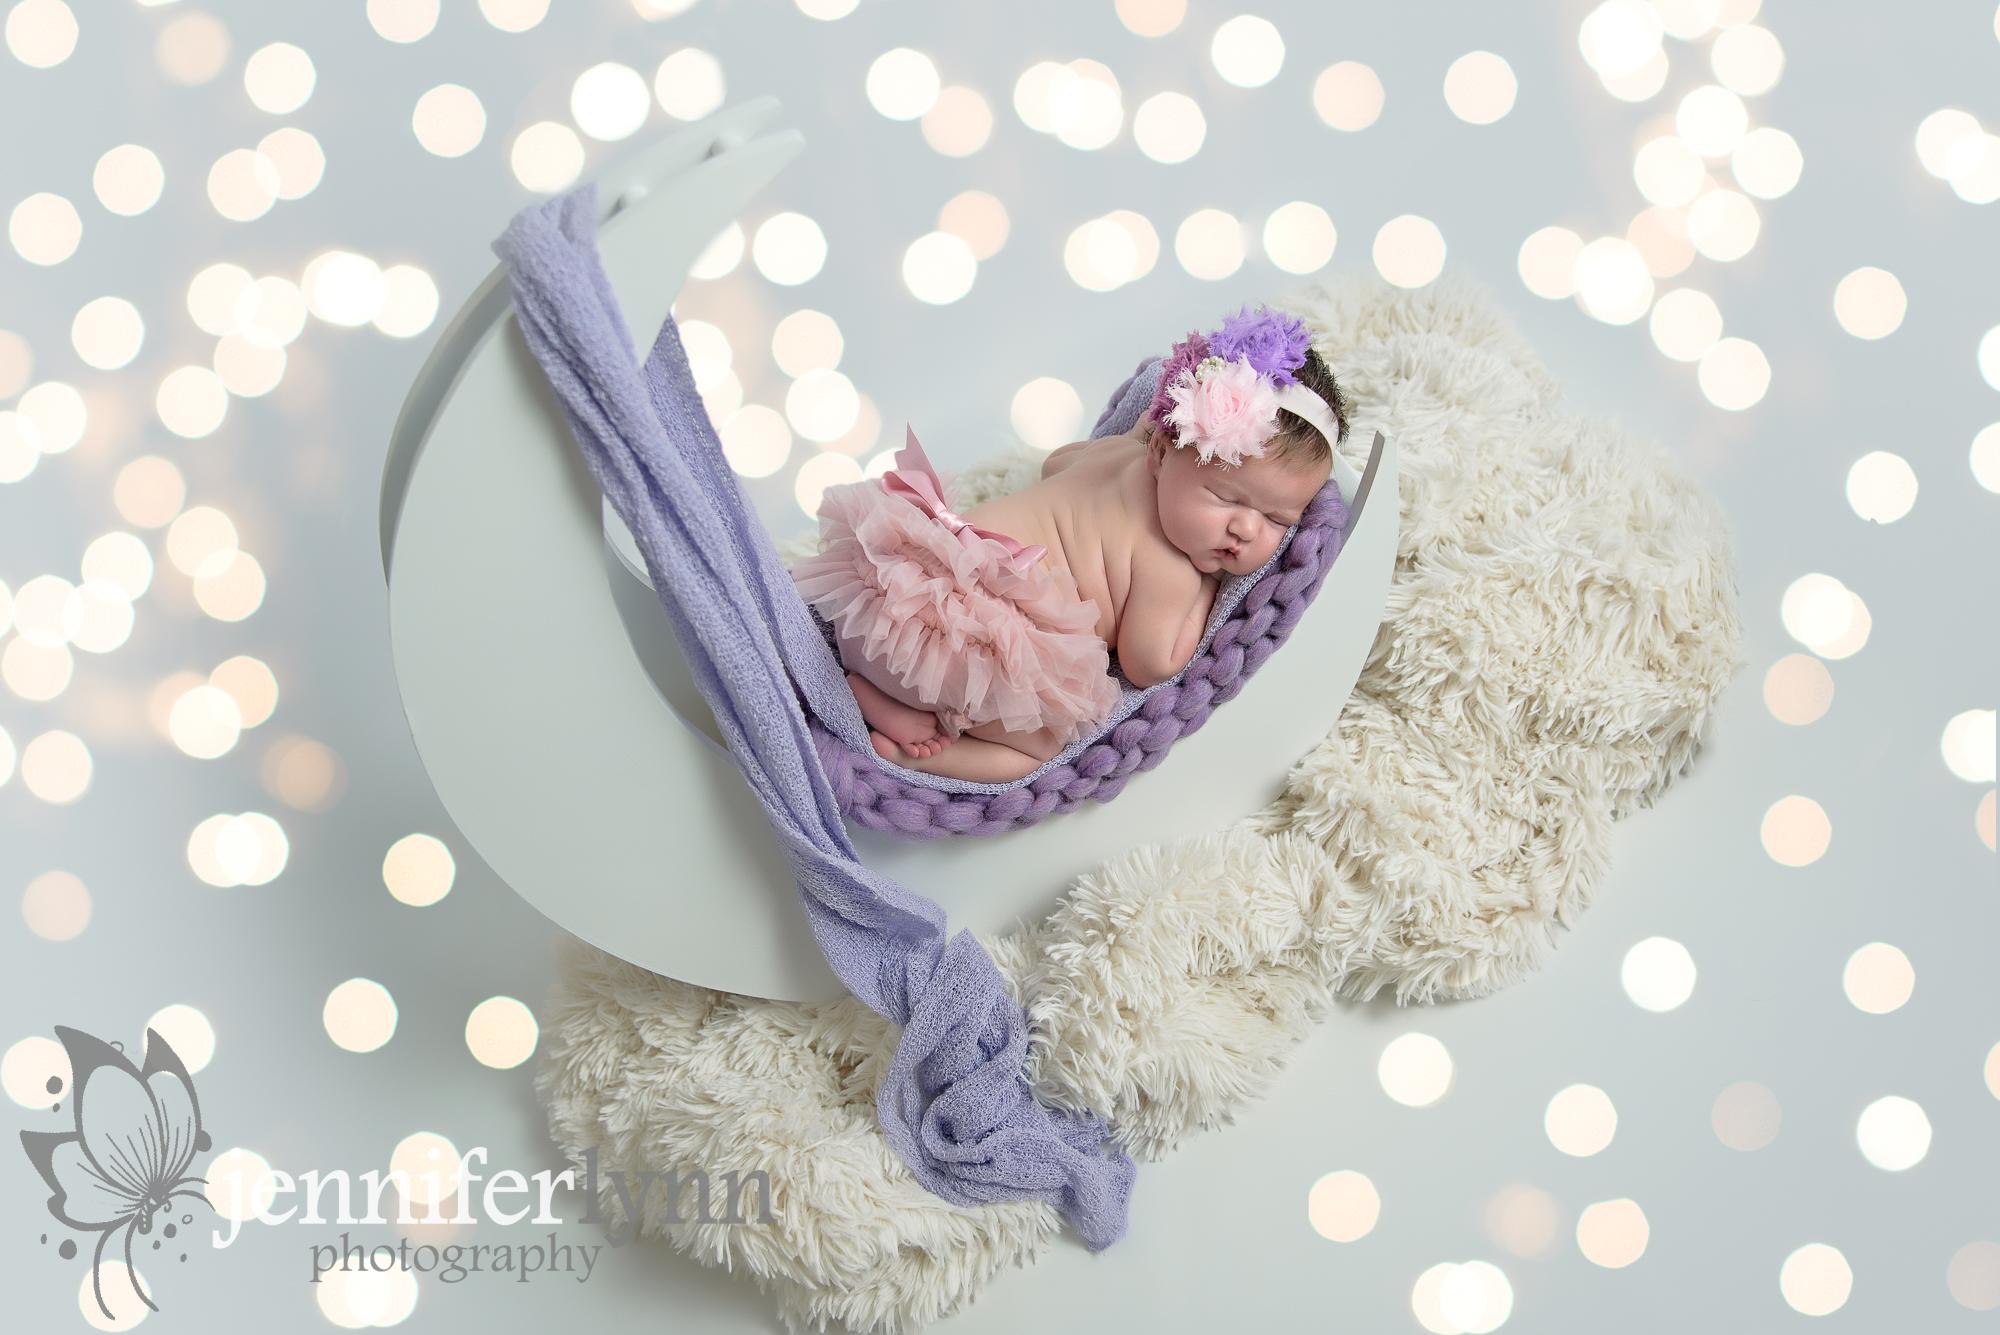 Newborn girl on moon prop with lights